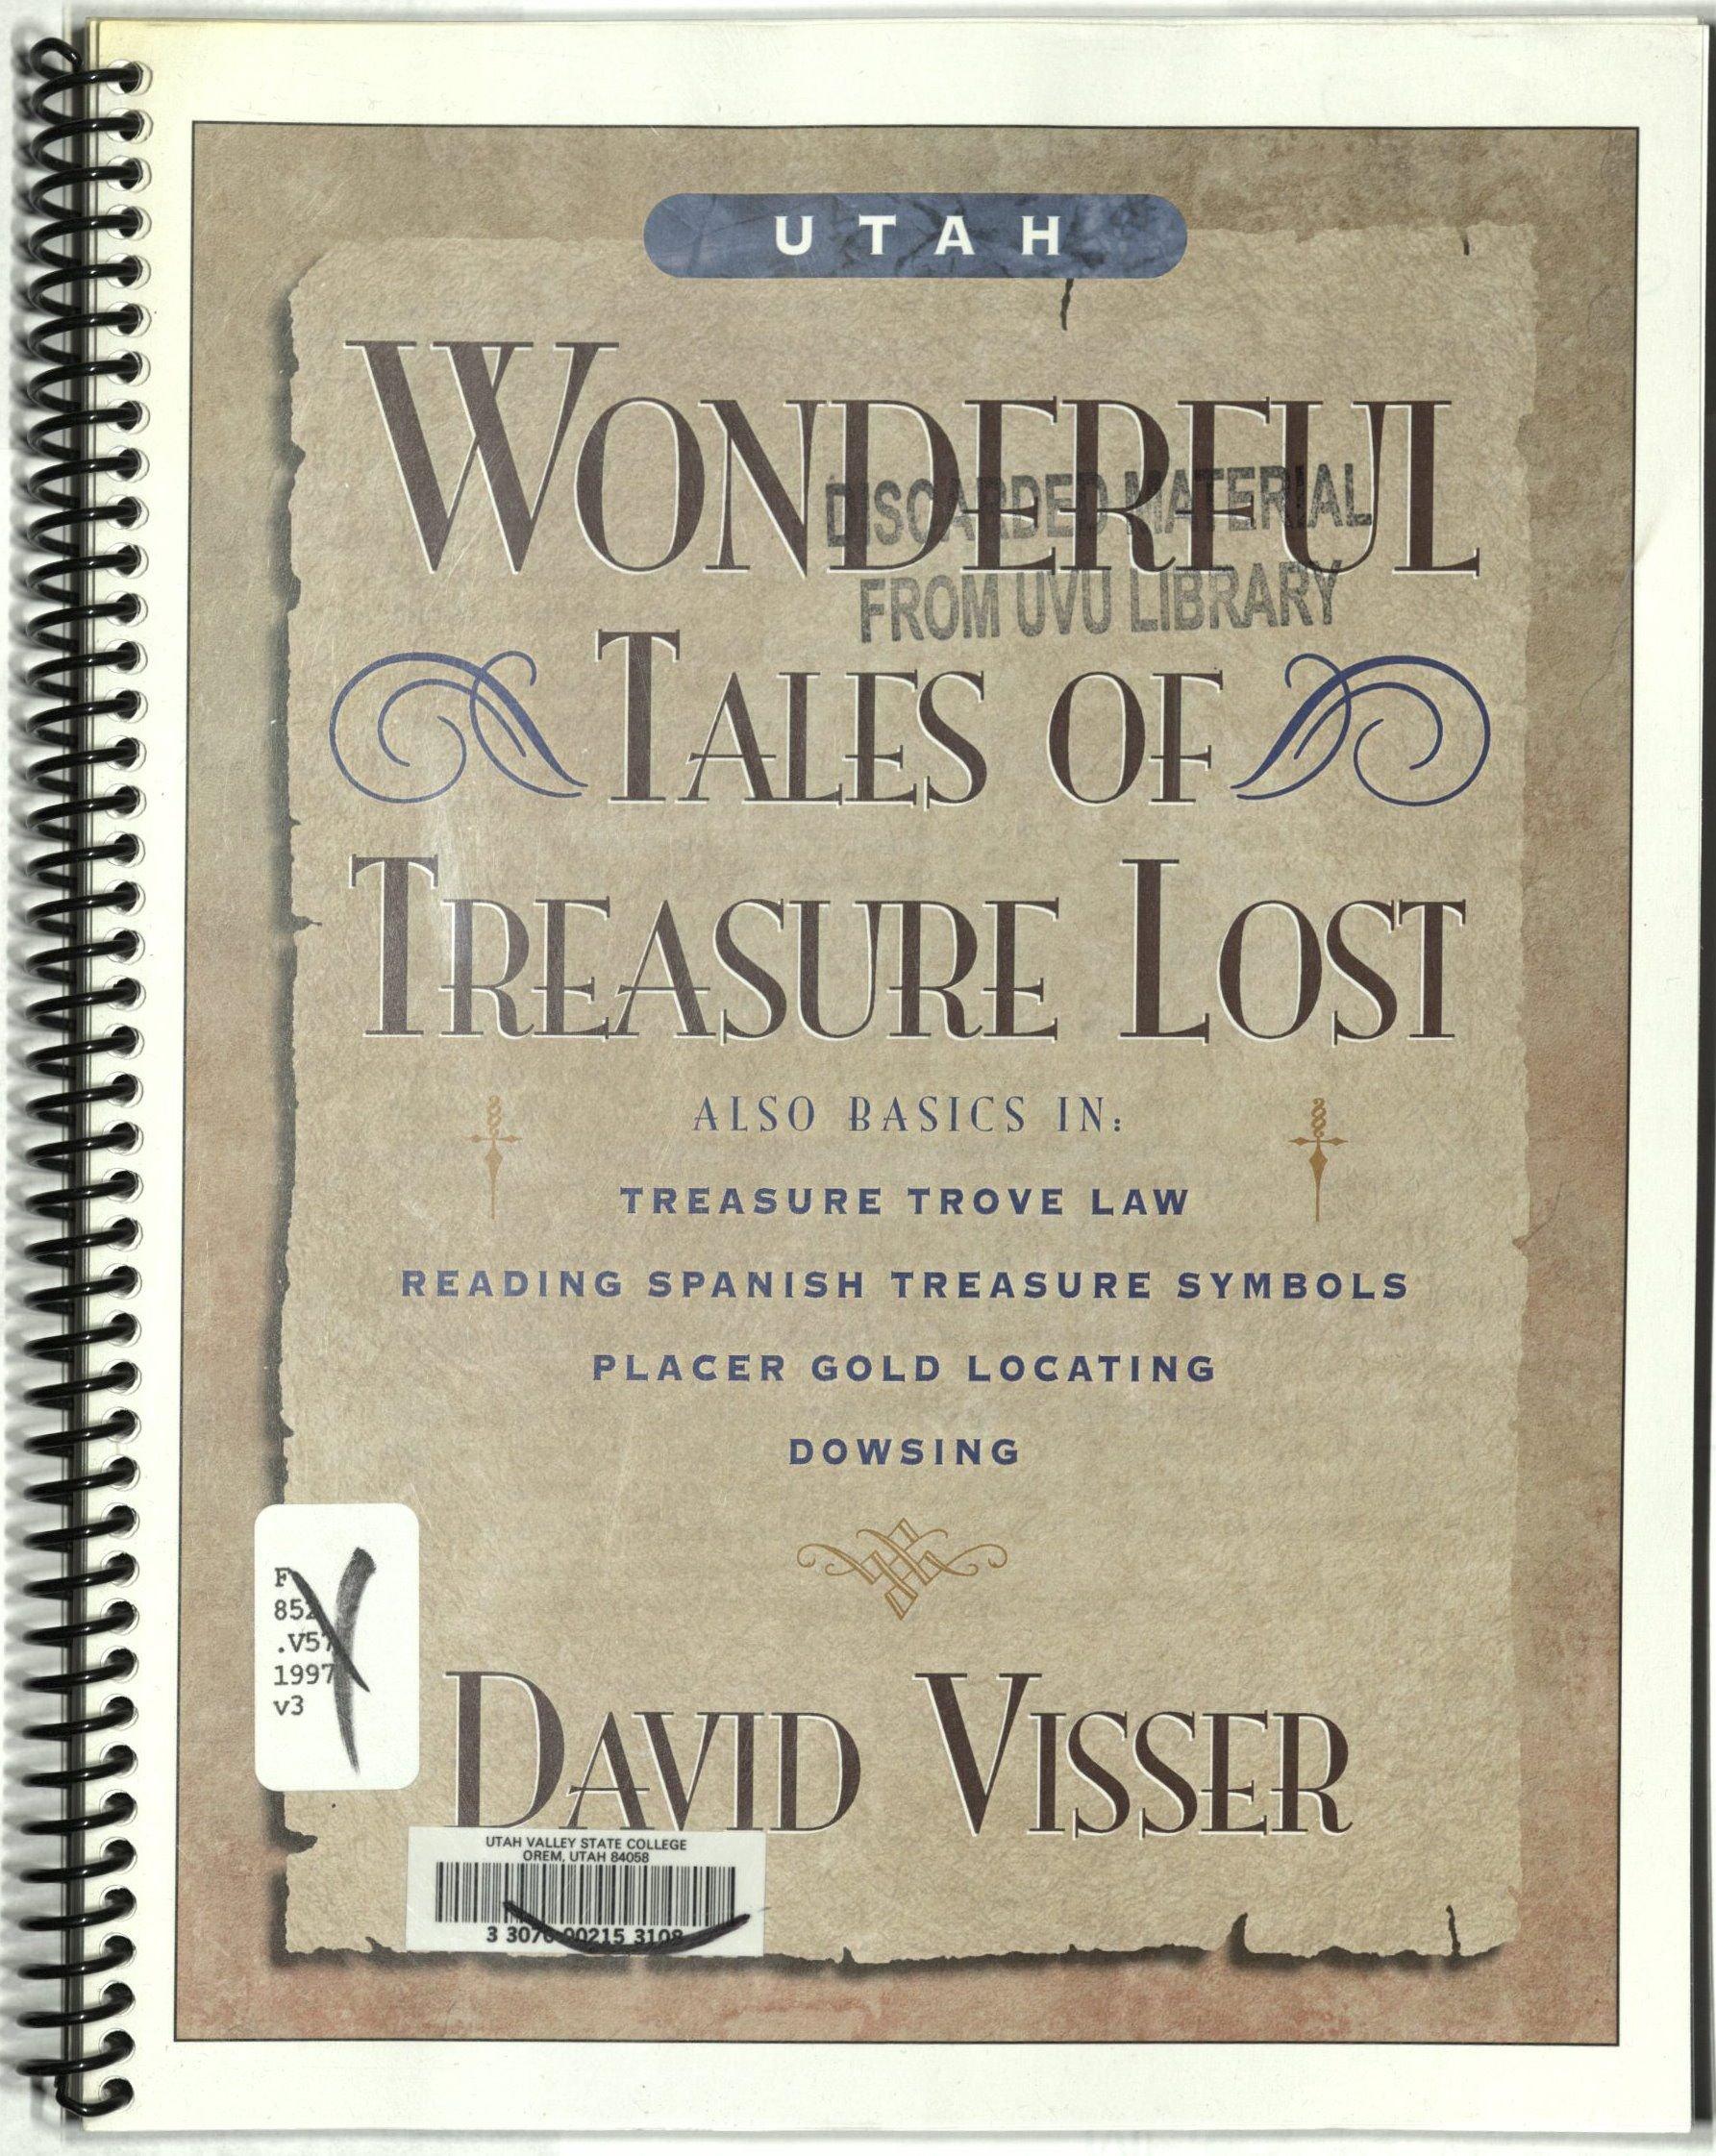 Wonderful tales of treasure lost: Also basics in : Treasure